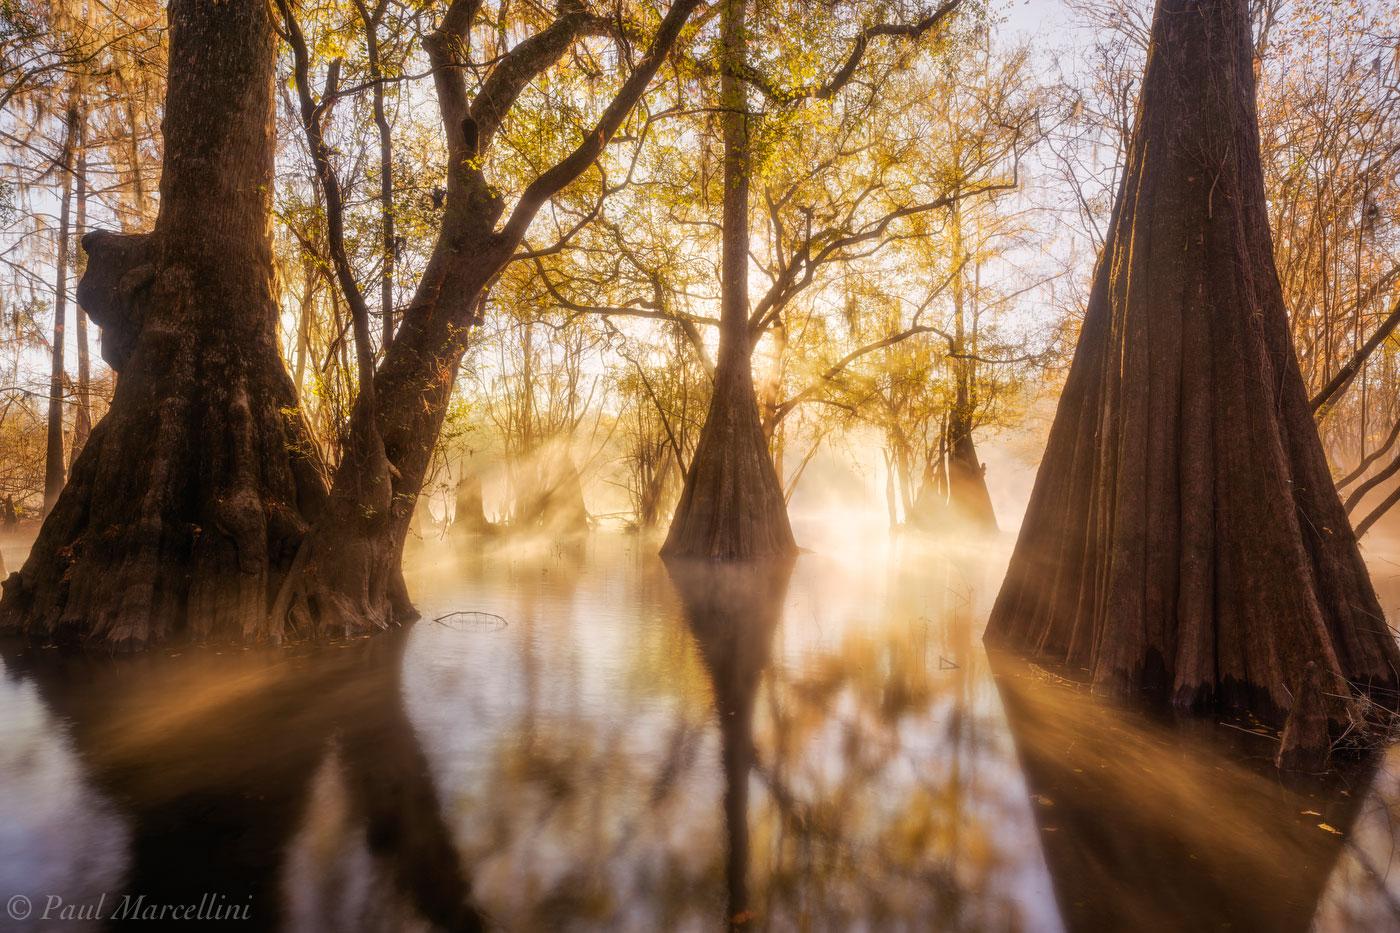 sunrise, fog, suwannee valley, florida, backwaters, nature, photography, photo